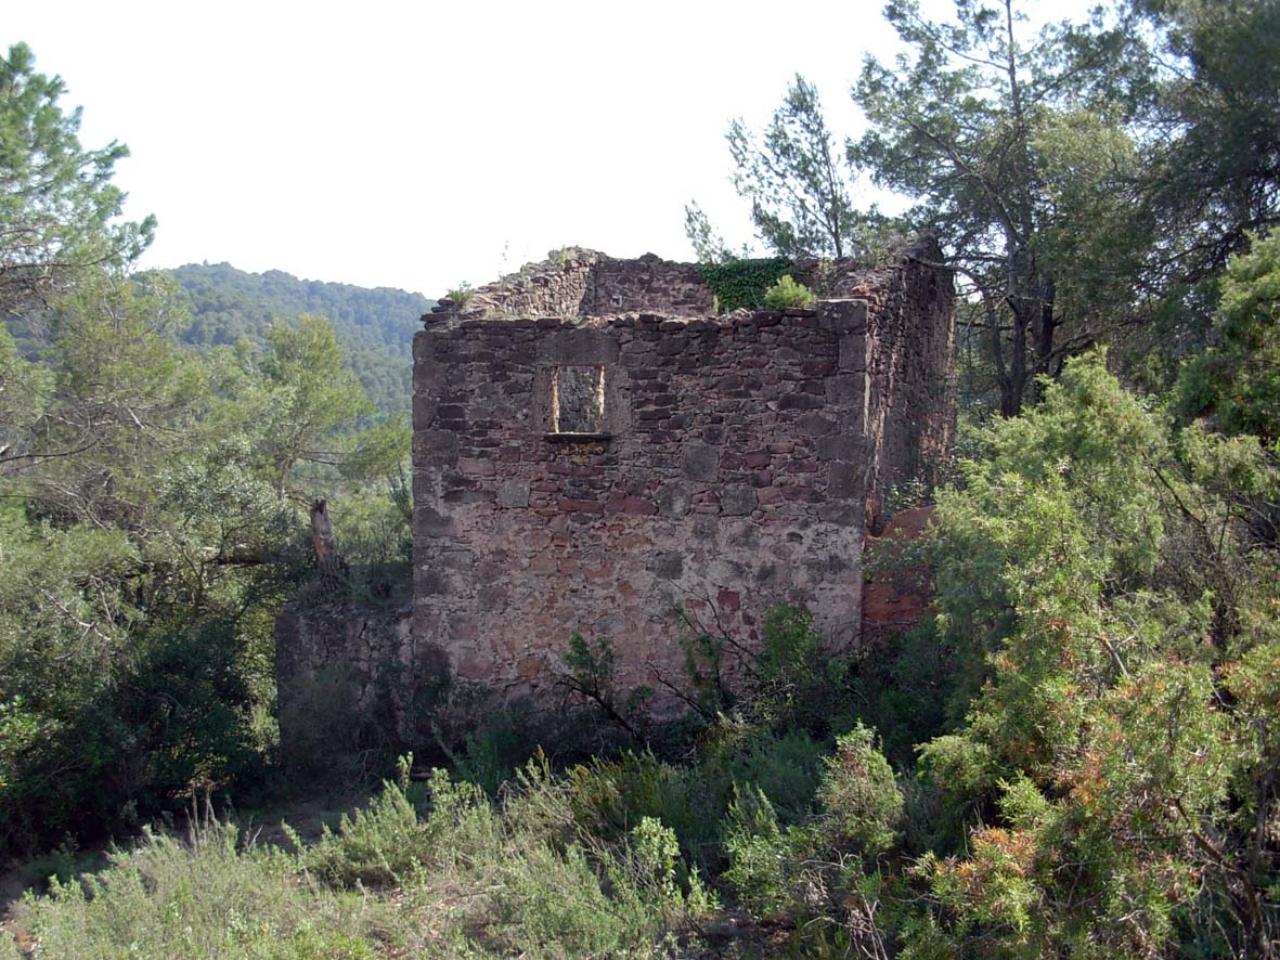 Casalot Corto Pio, al terme municipal de Vacarisses | Xarxa de Parc DIba